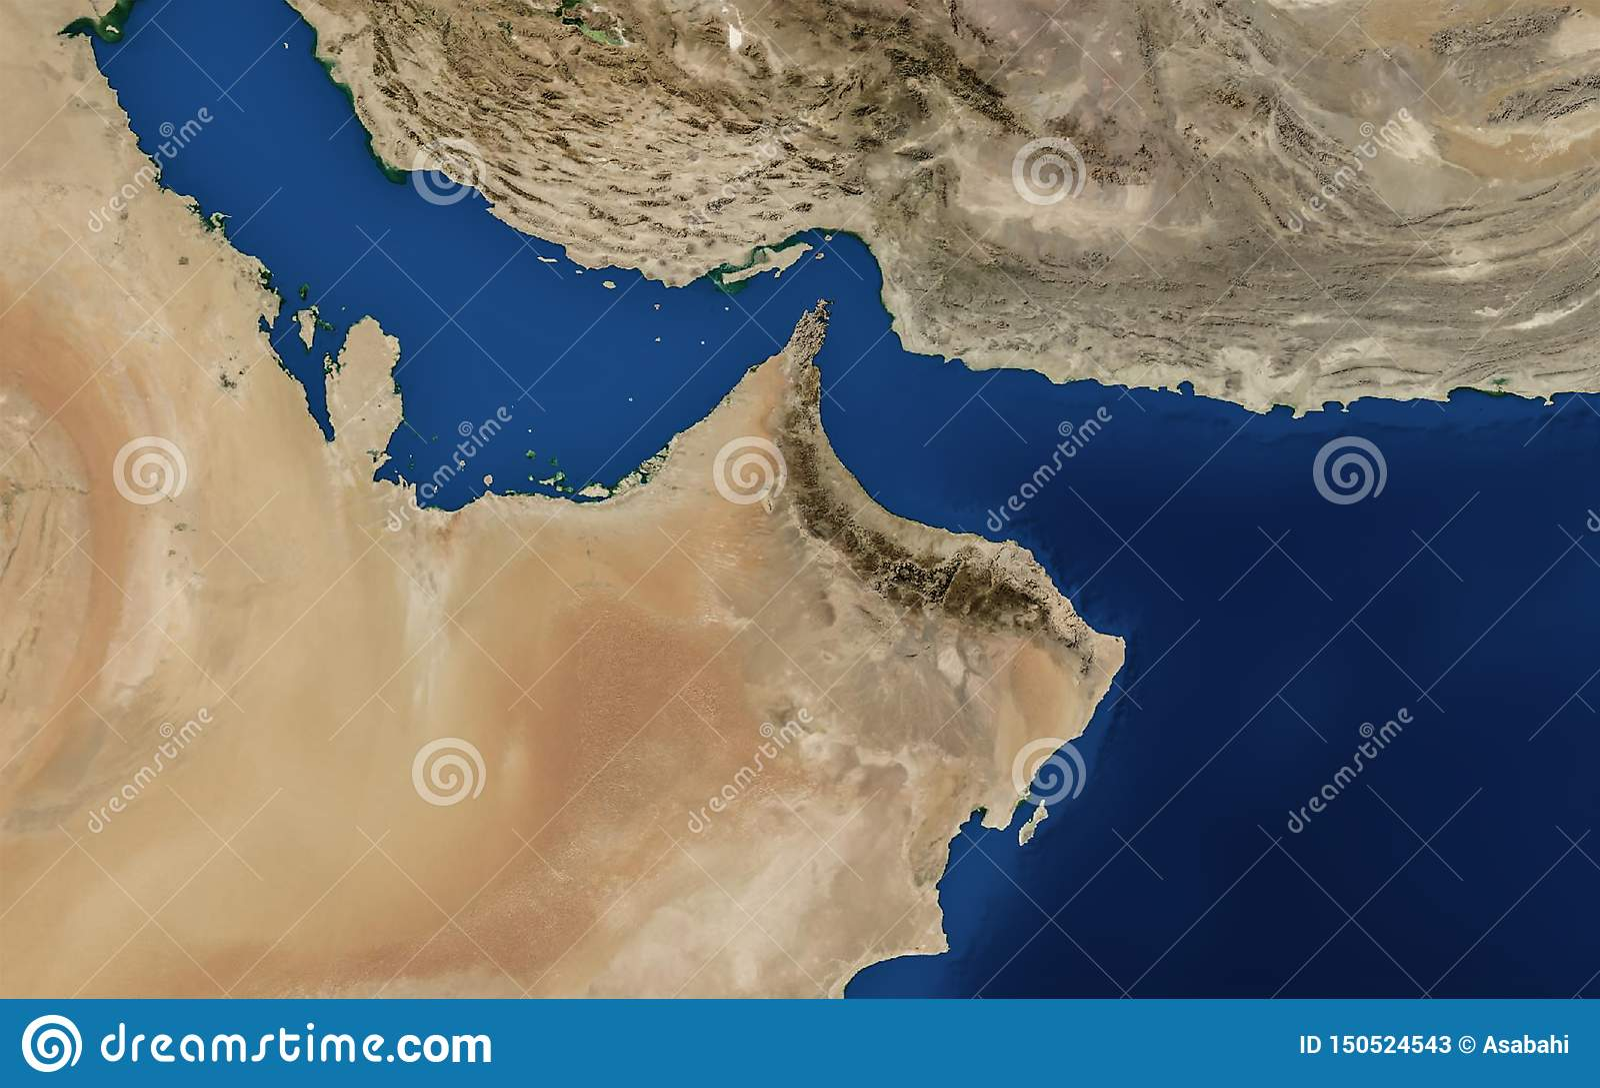 Arabska Zatoki Mapa Uae Oman Iran Qatar Bahrian Zatoka